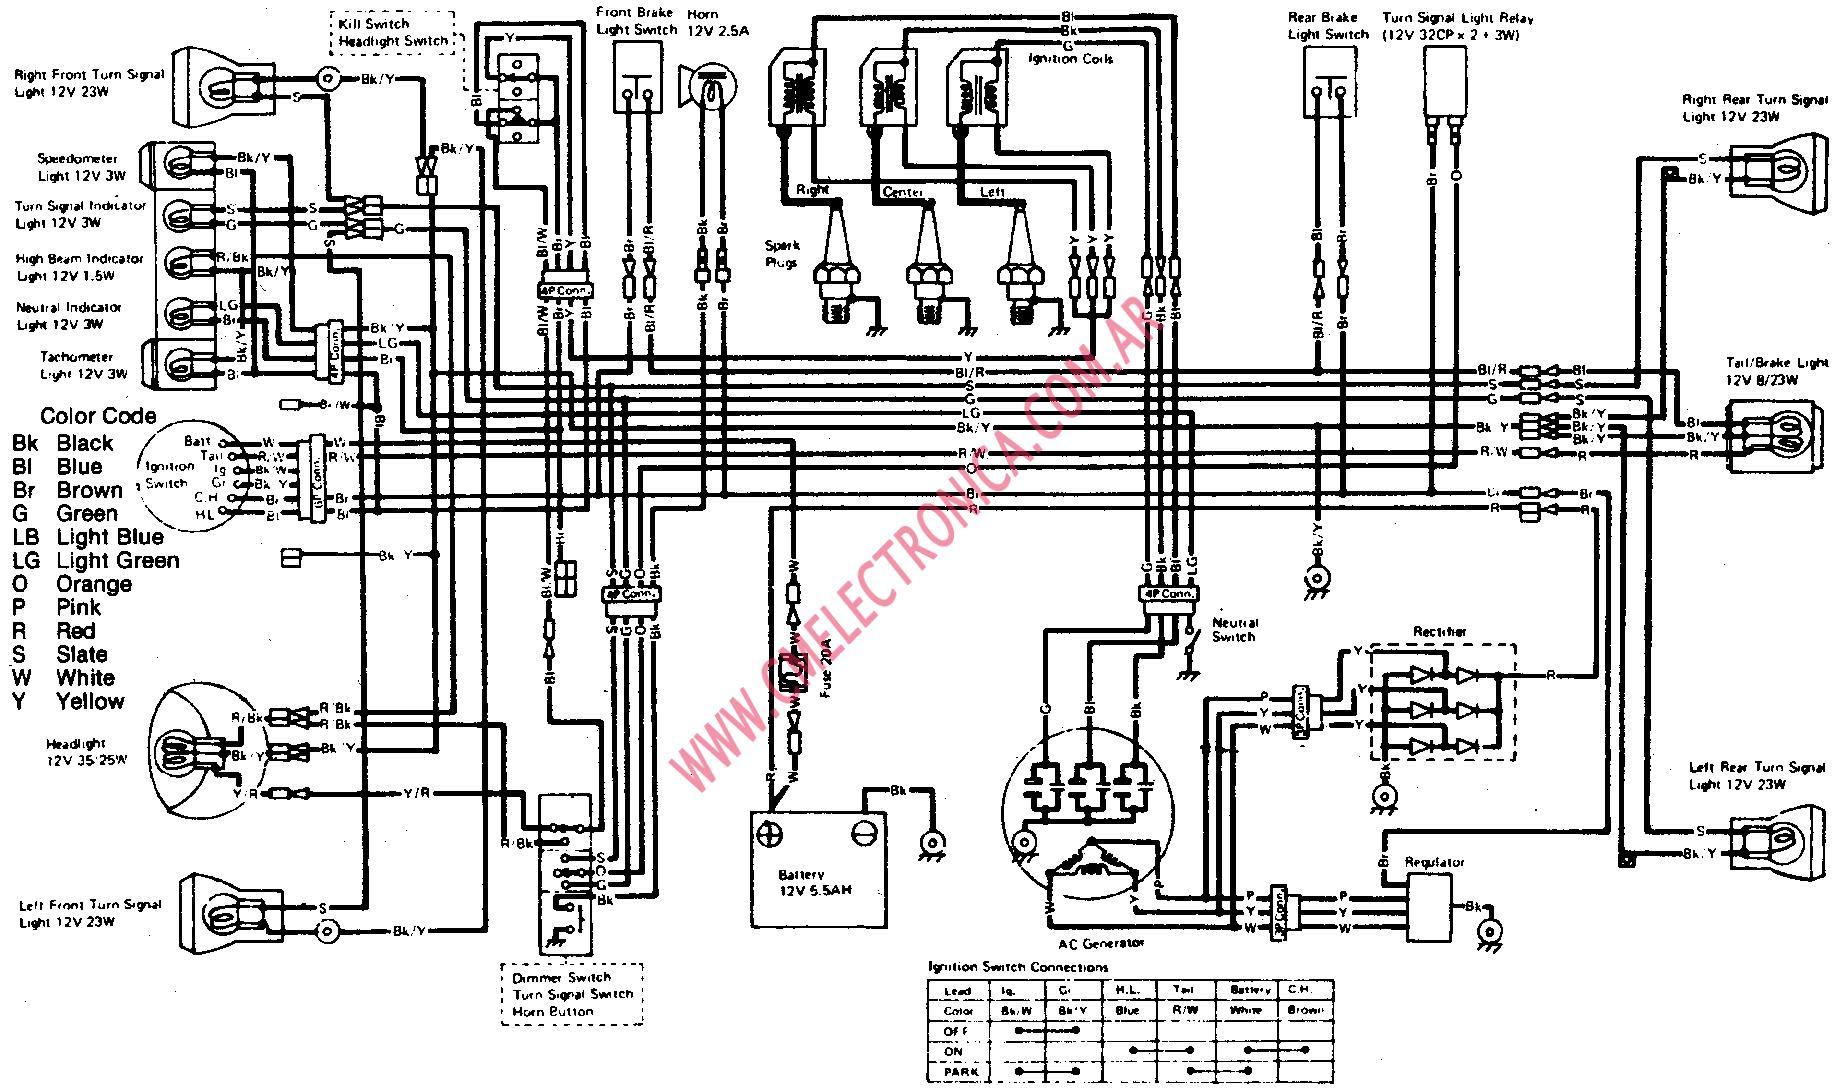 DIAGRAM] 86 Bayou 185 Wiring Diagram FULL Version HD Quality Wiring Diagram  - TVDIAGRAM.HOSTERIA87.IT | Bayou Kawasaki Klf185 A Wiring Diagram |  | Diagram Database